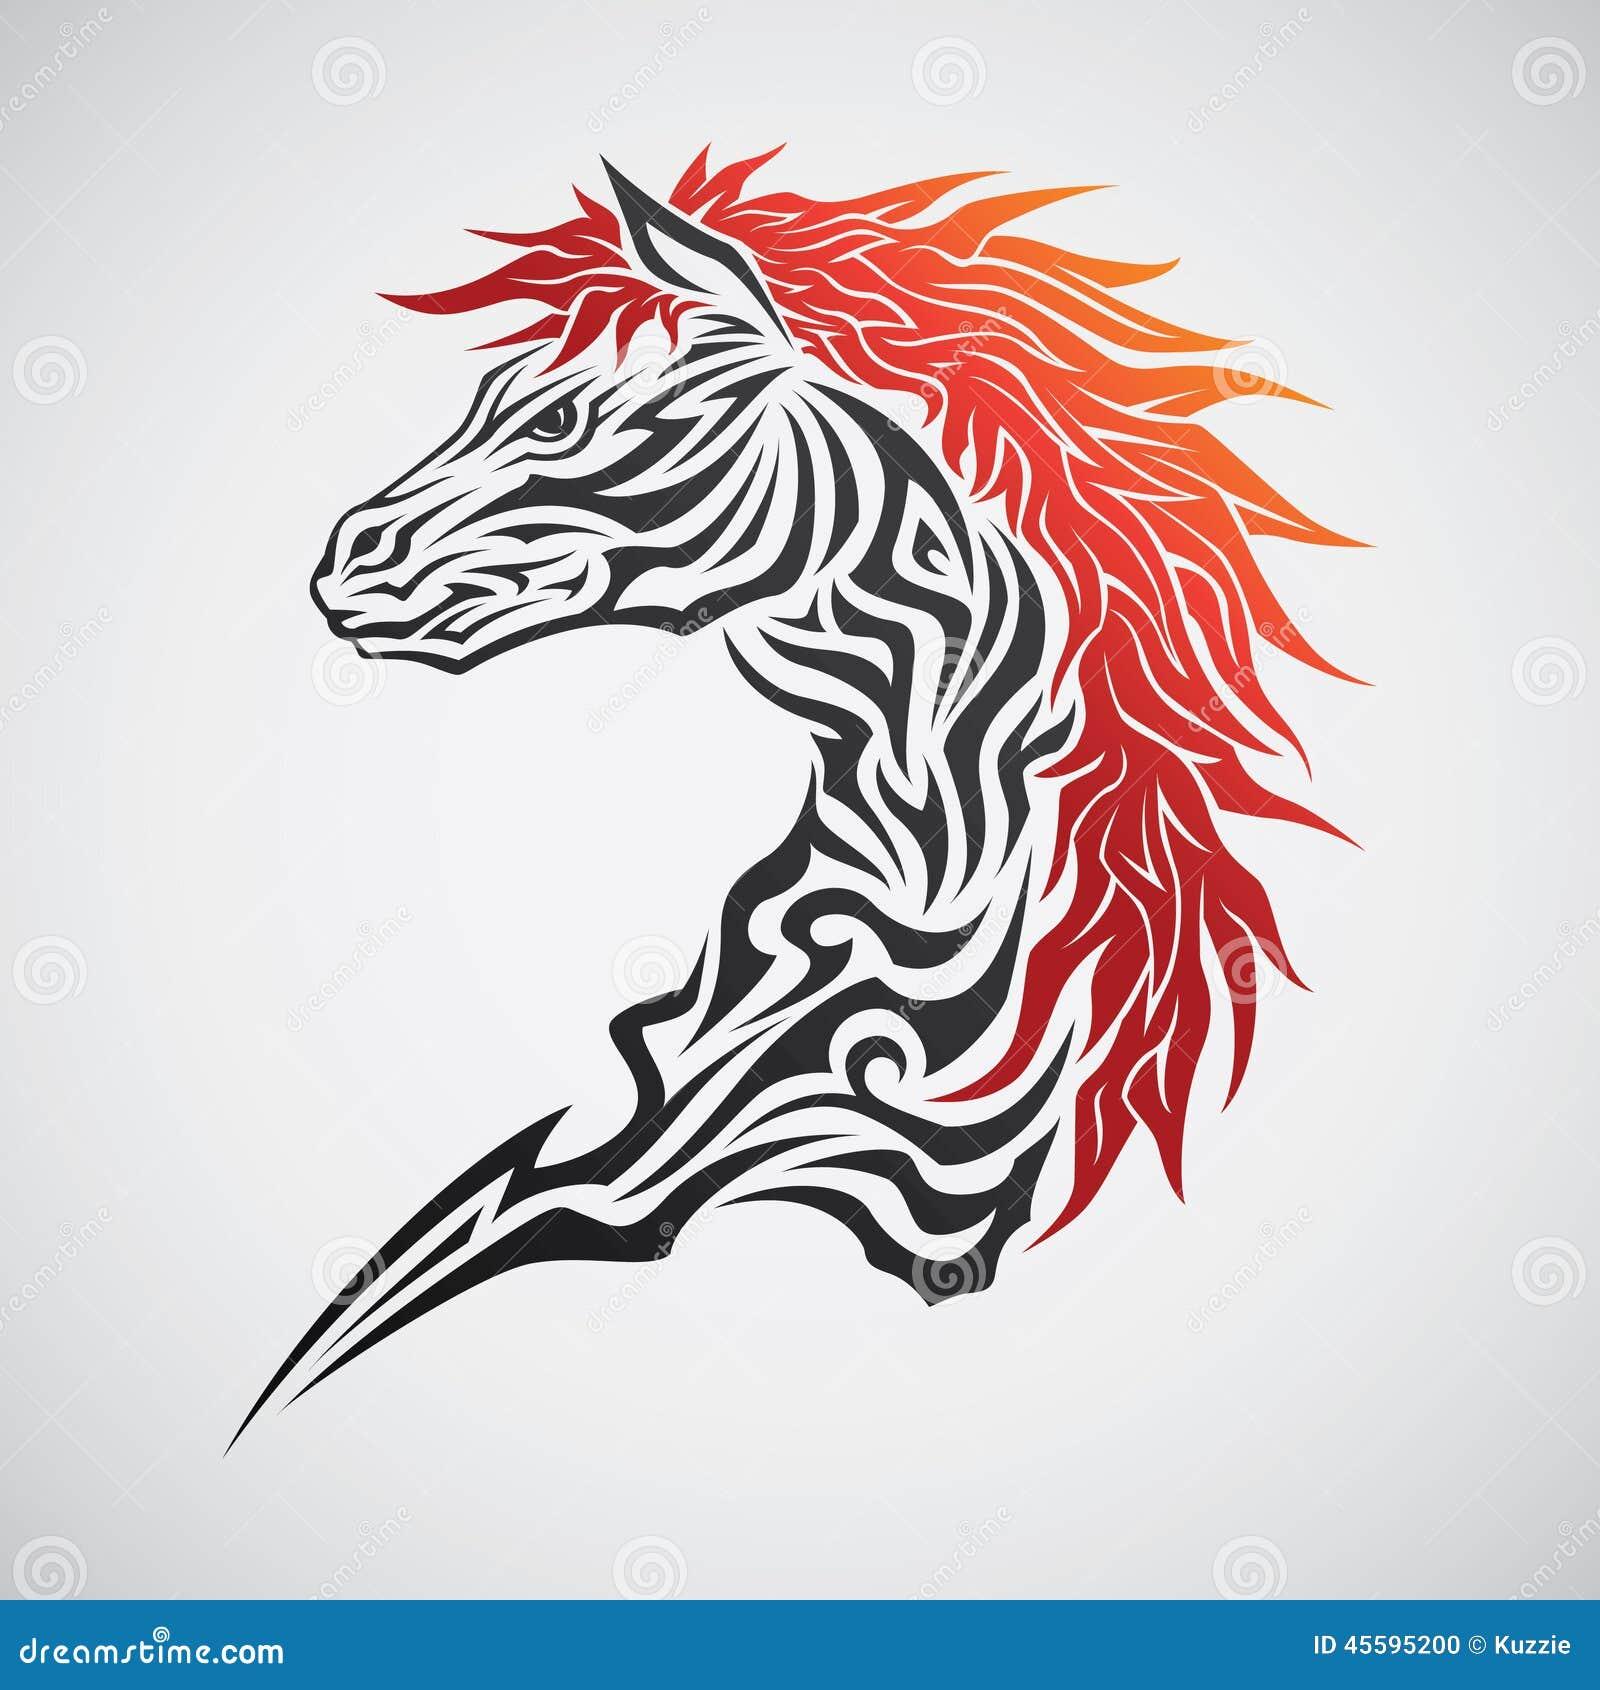 Tribal horse head tattoo cartoon vector cartoondealer for Thoroughbred tattoo lookup